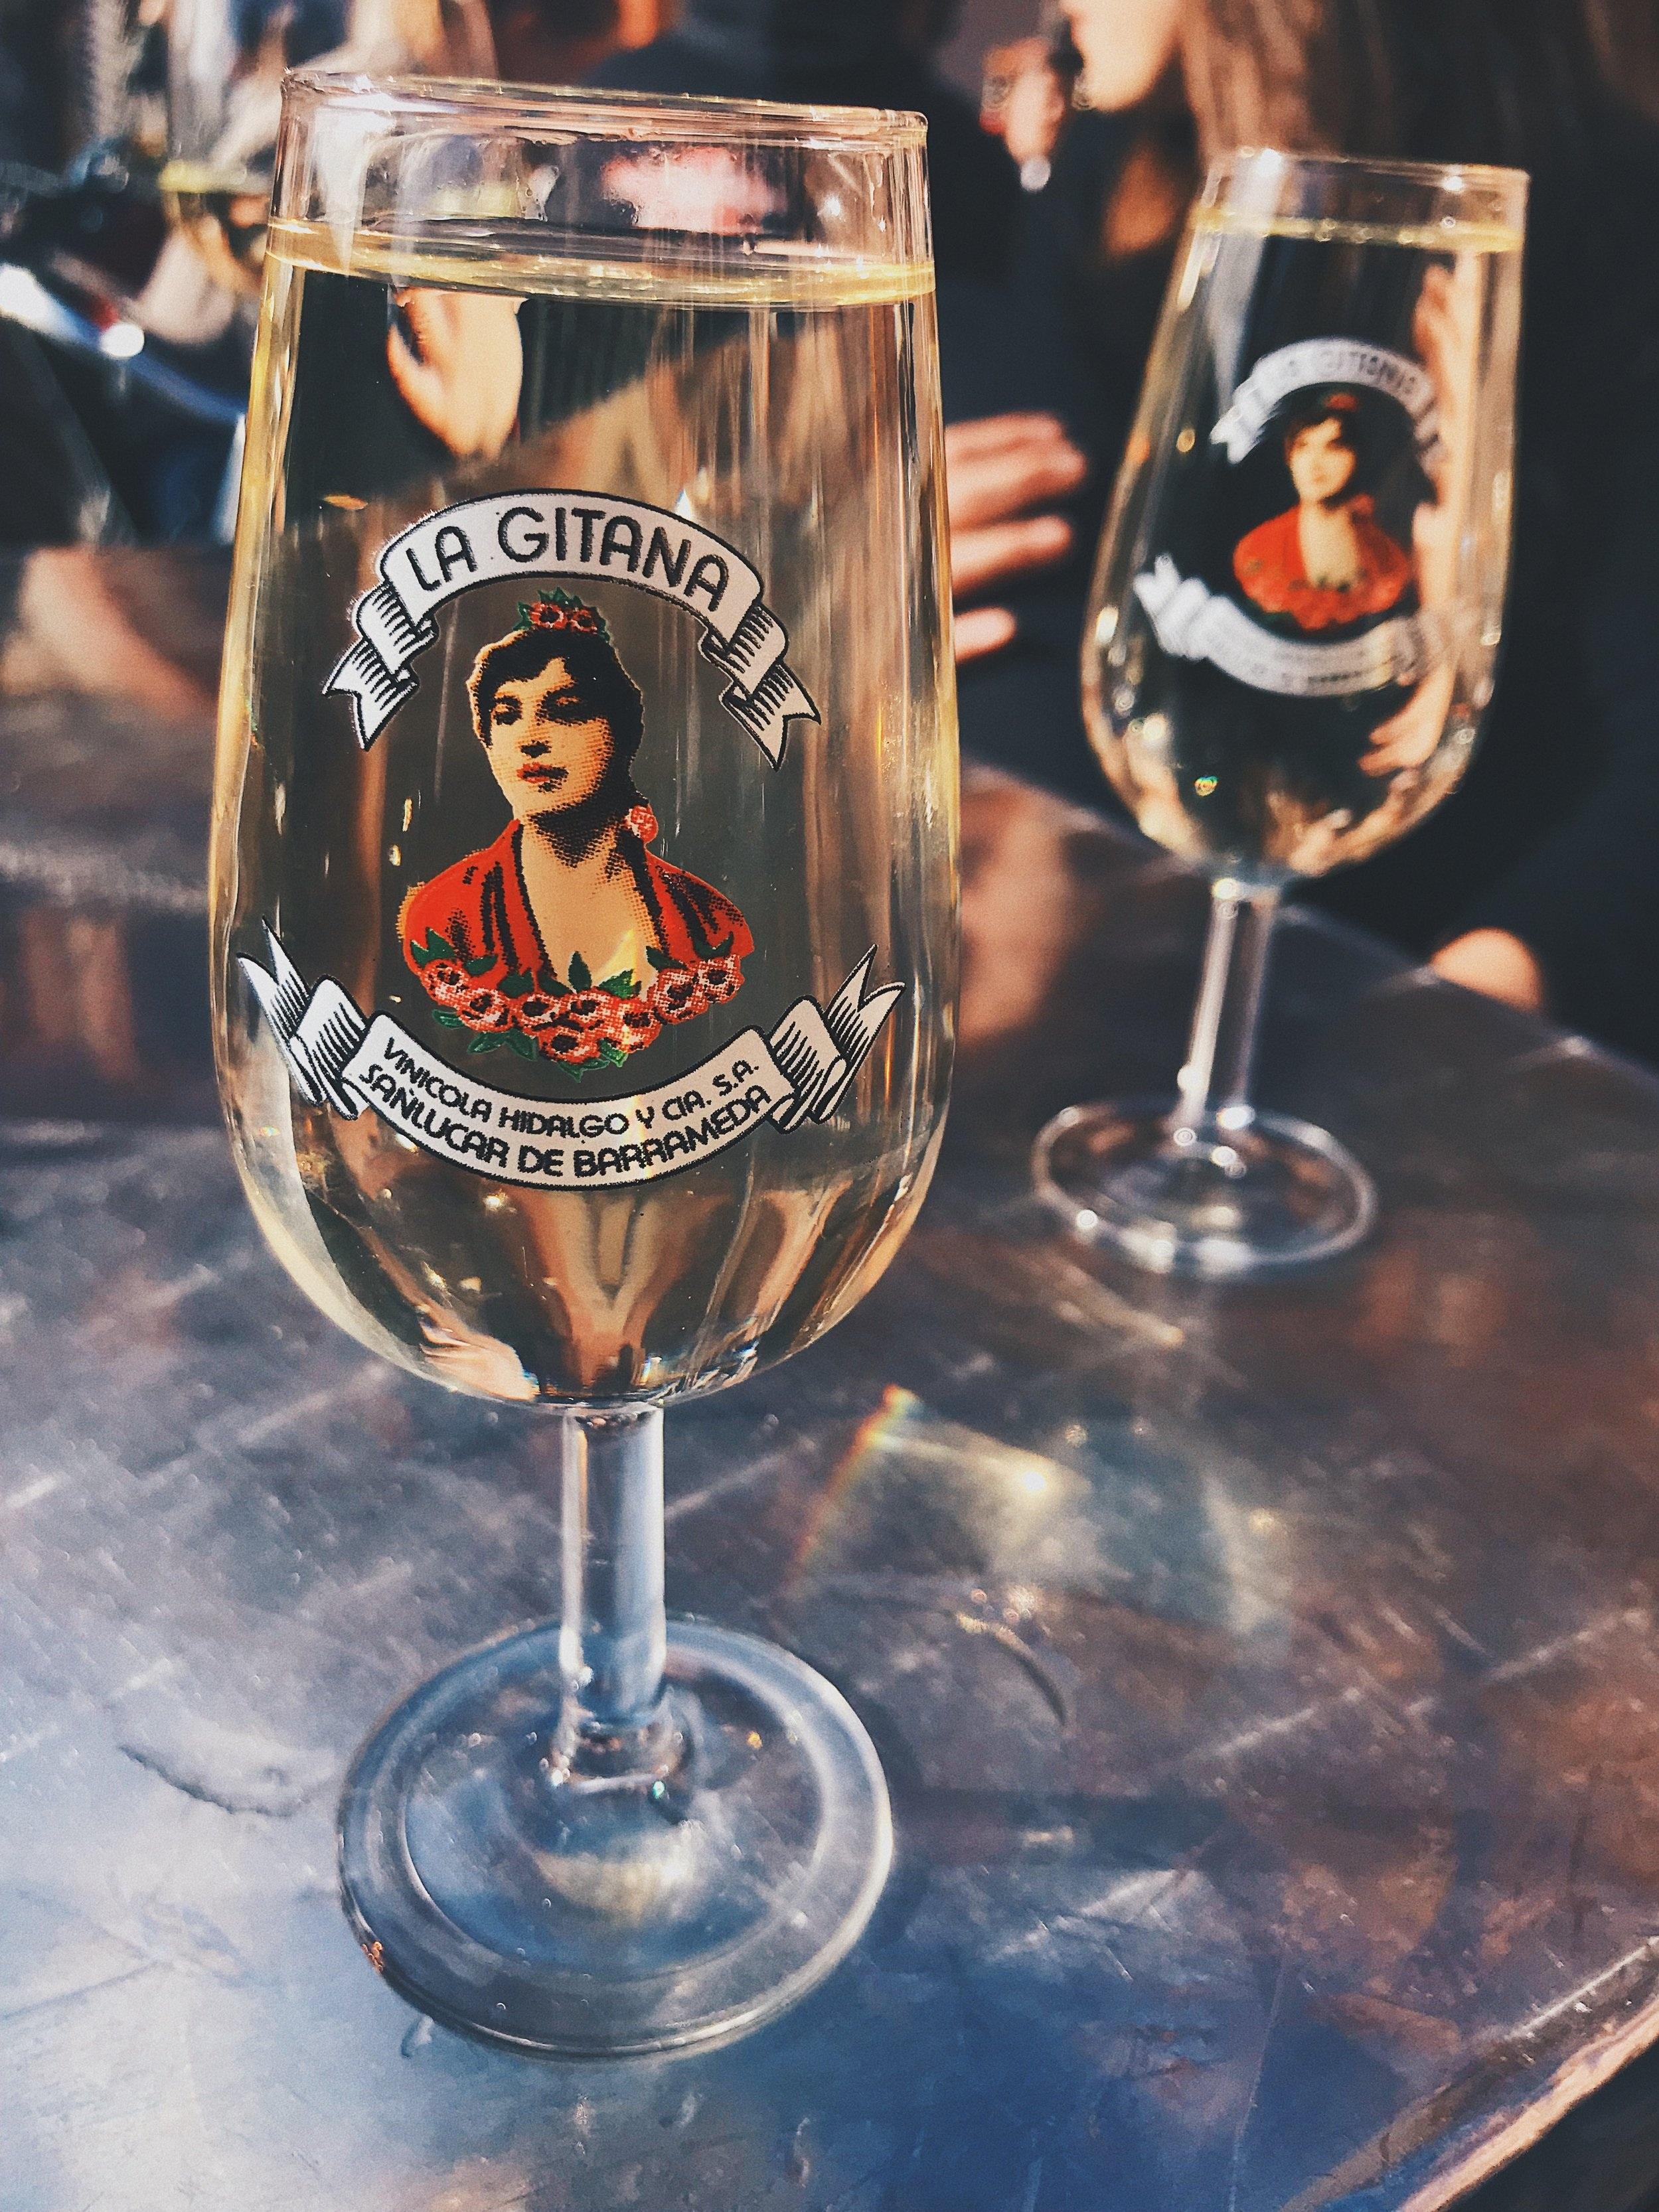 Vino fino , the region's specialty.